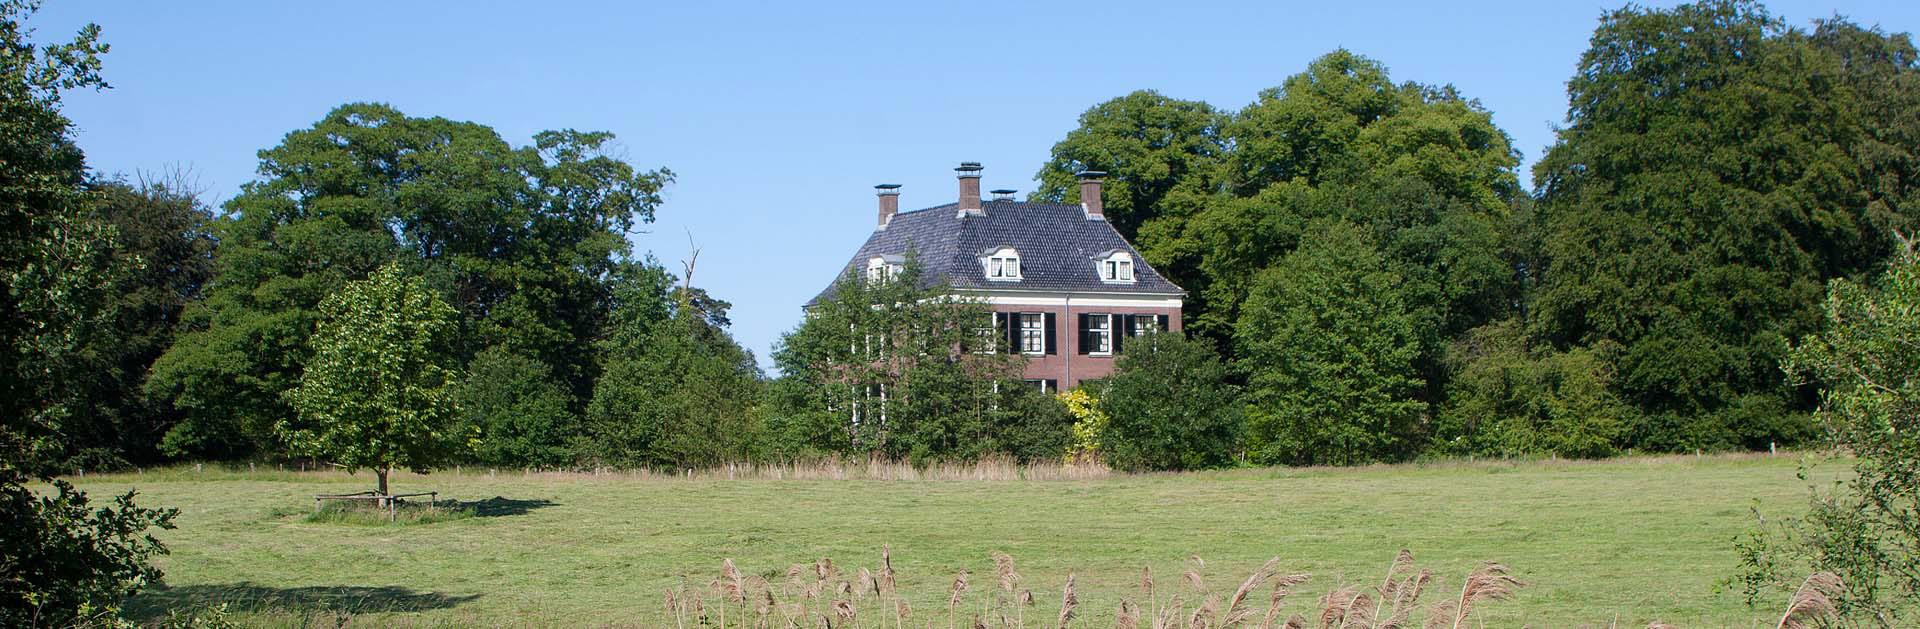 Landhuis Dorth - Kring van Dorth